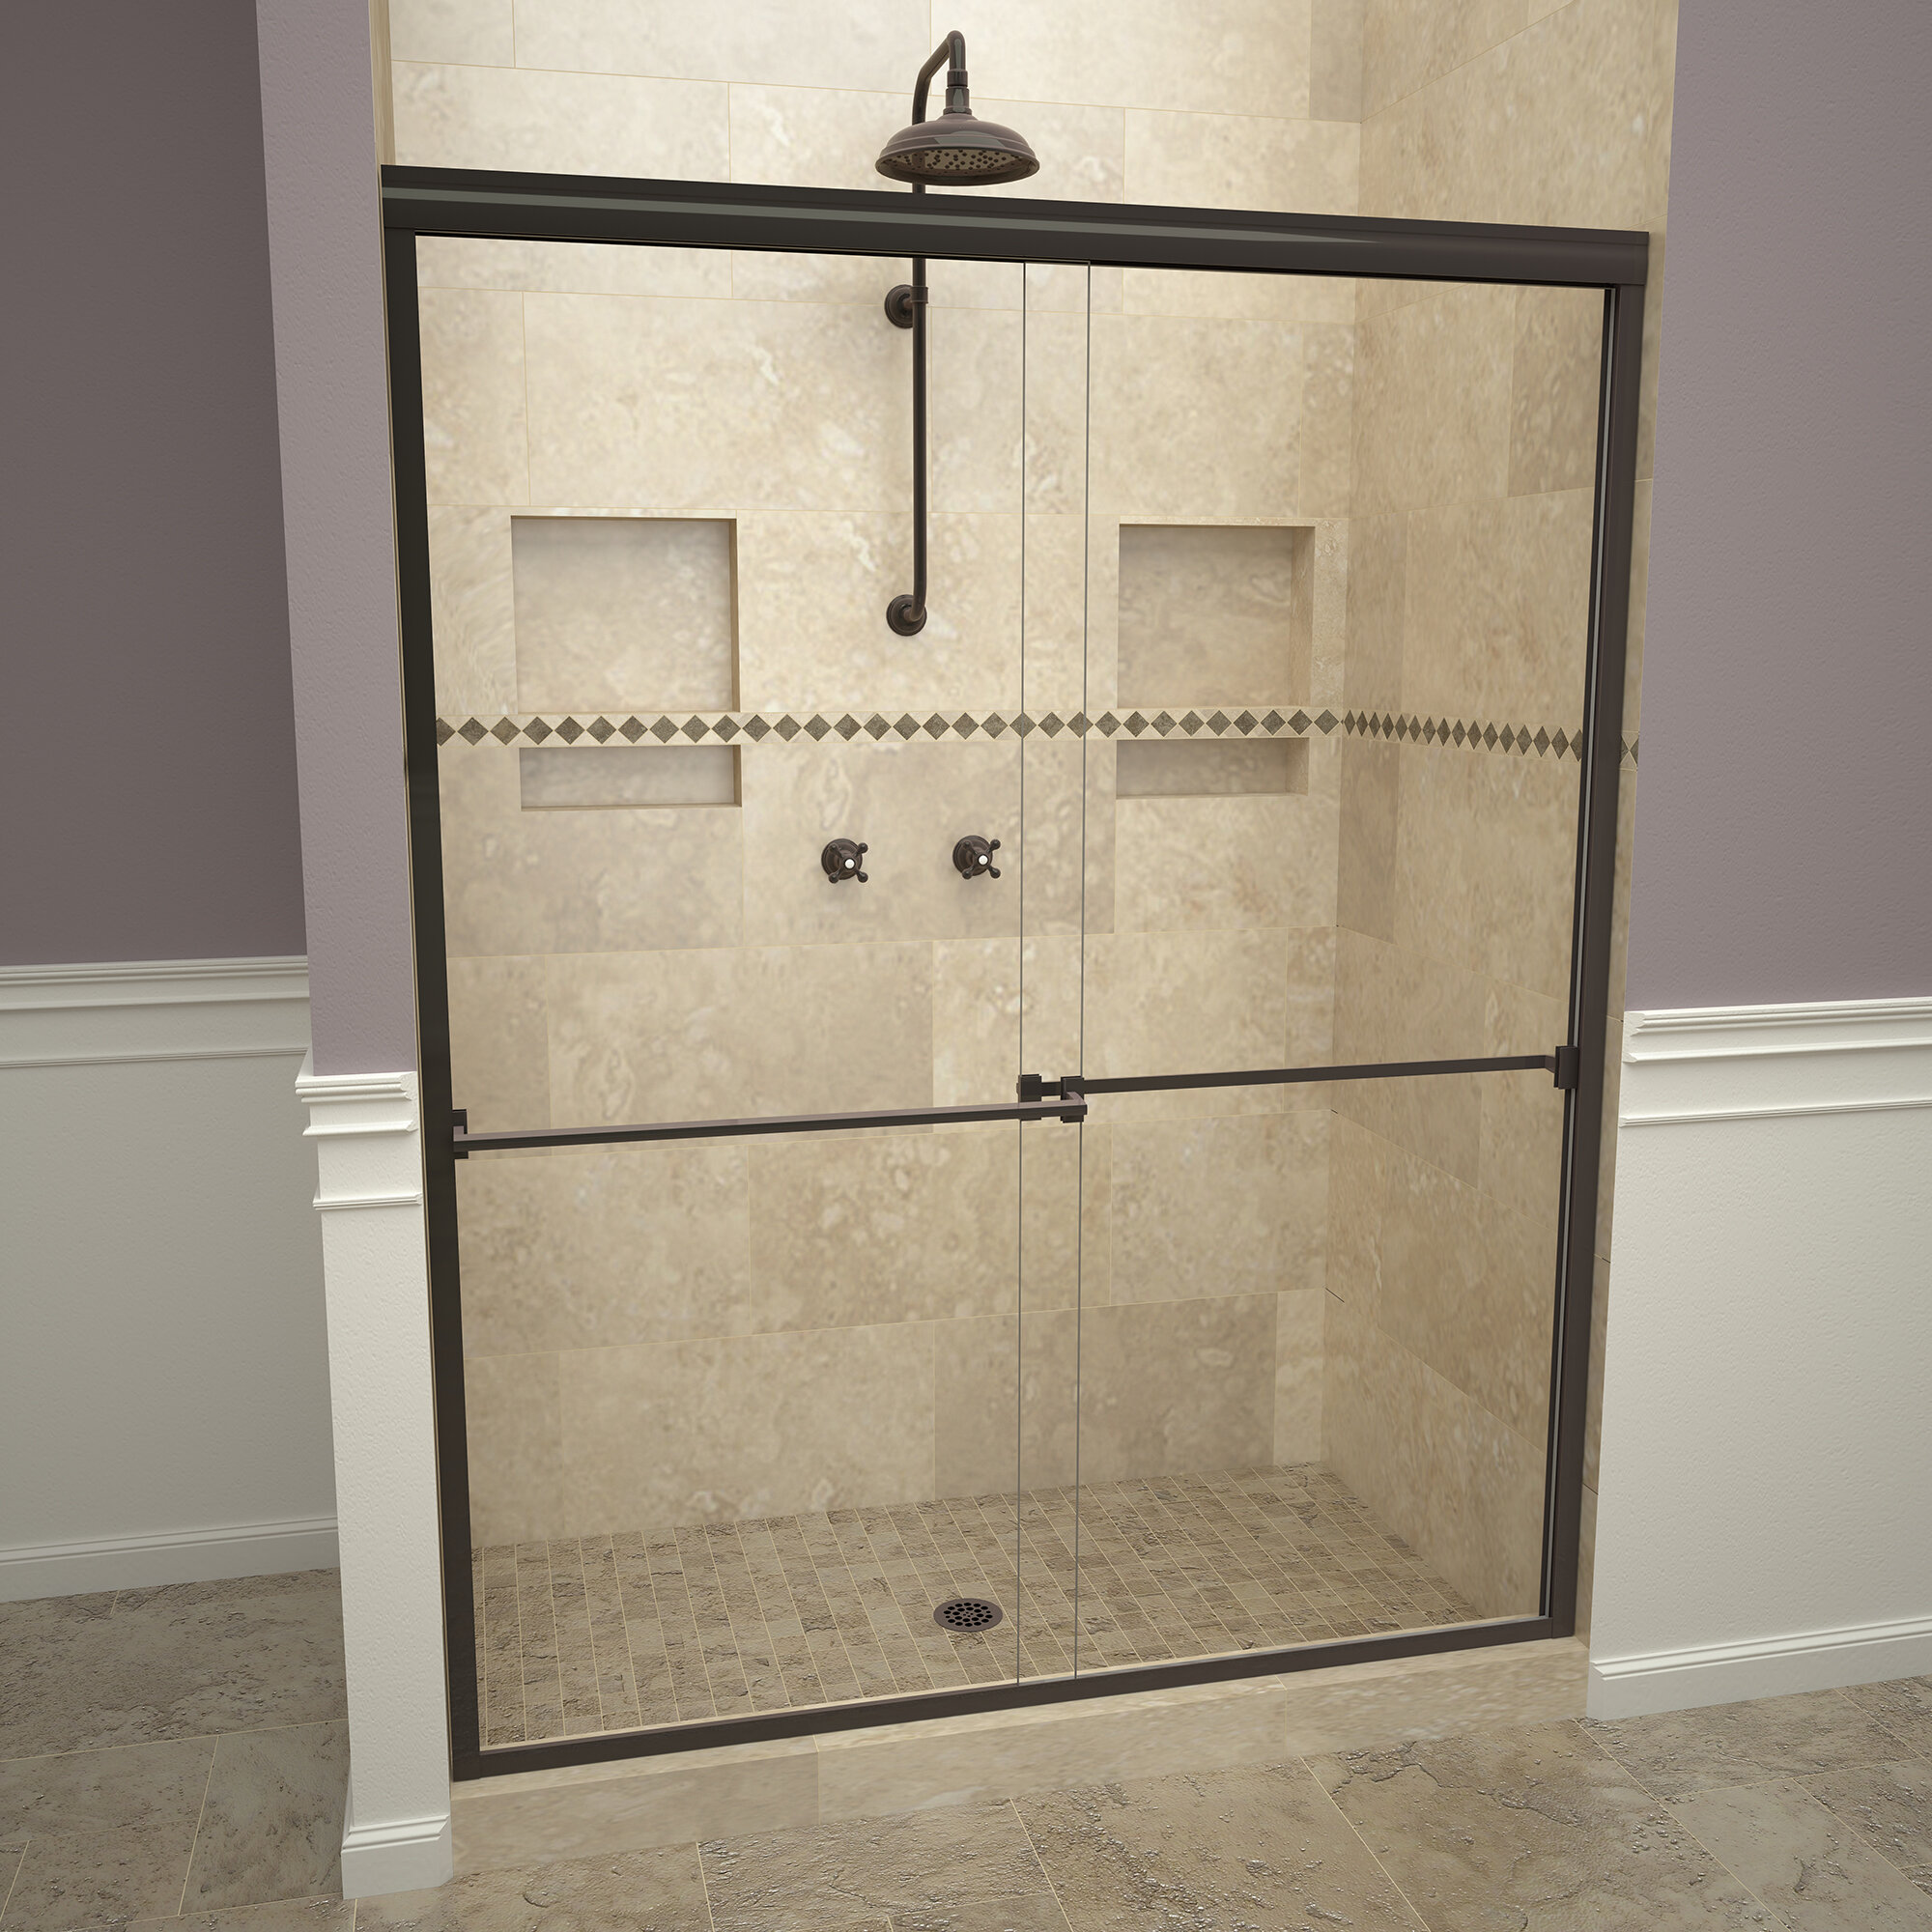 Details About 1000 Series 60 X70 Double Sliding Semi Frameless Shower Door Oil Rubbed Bronze